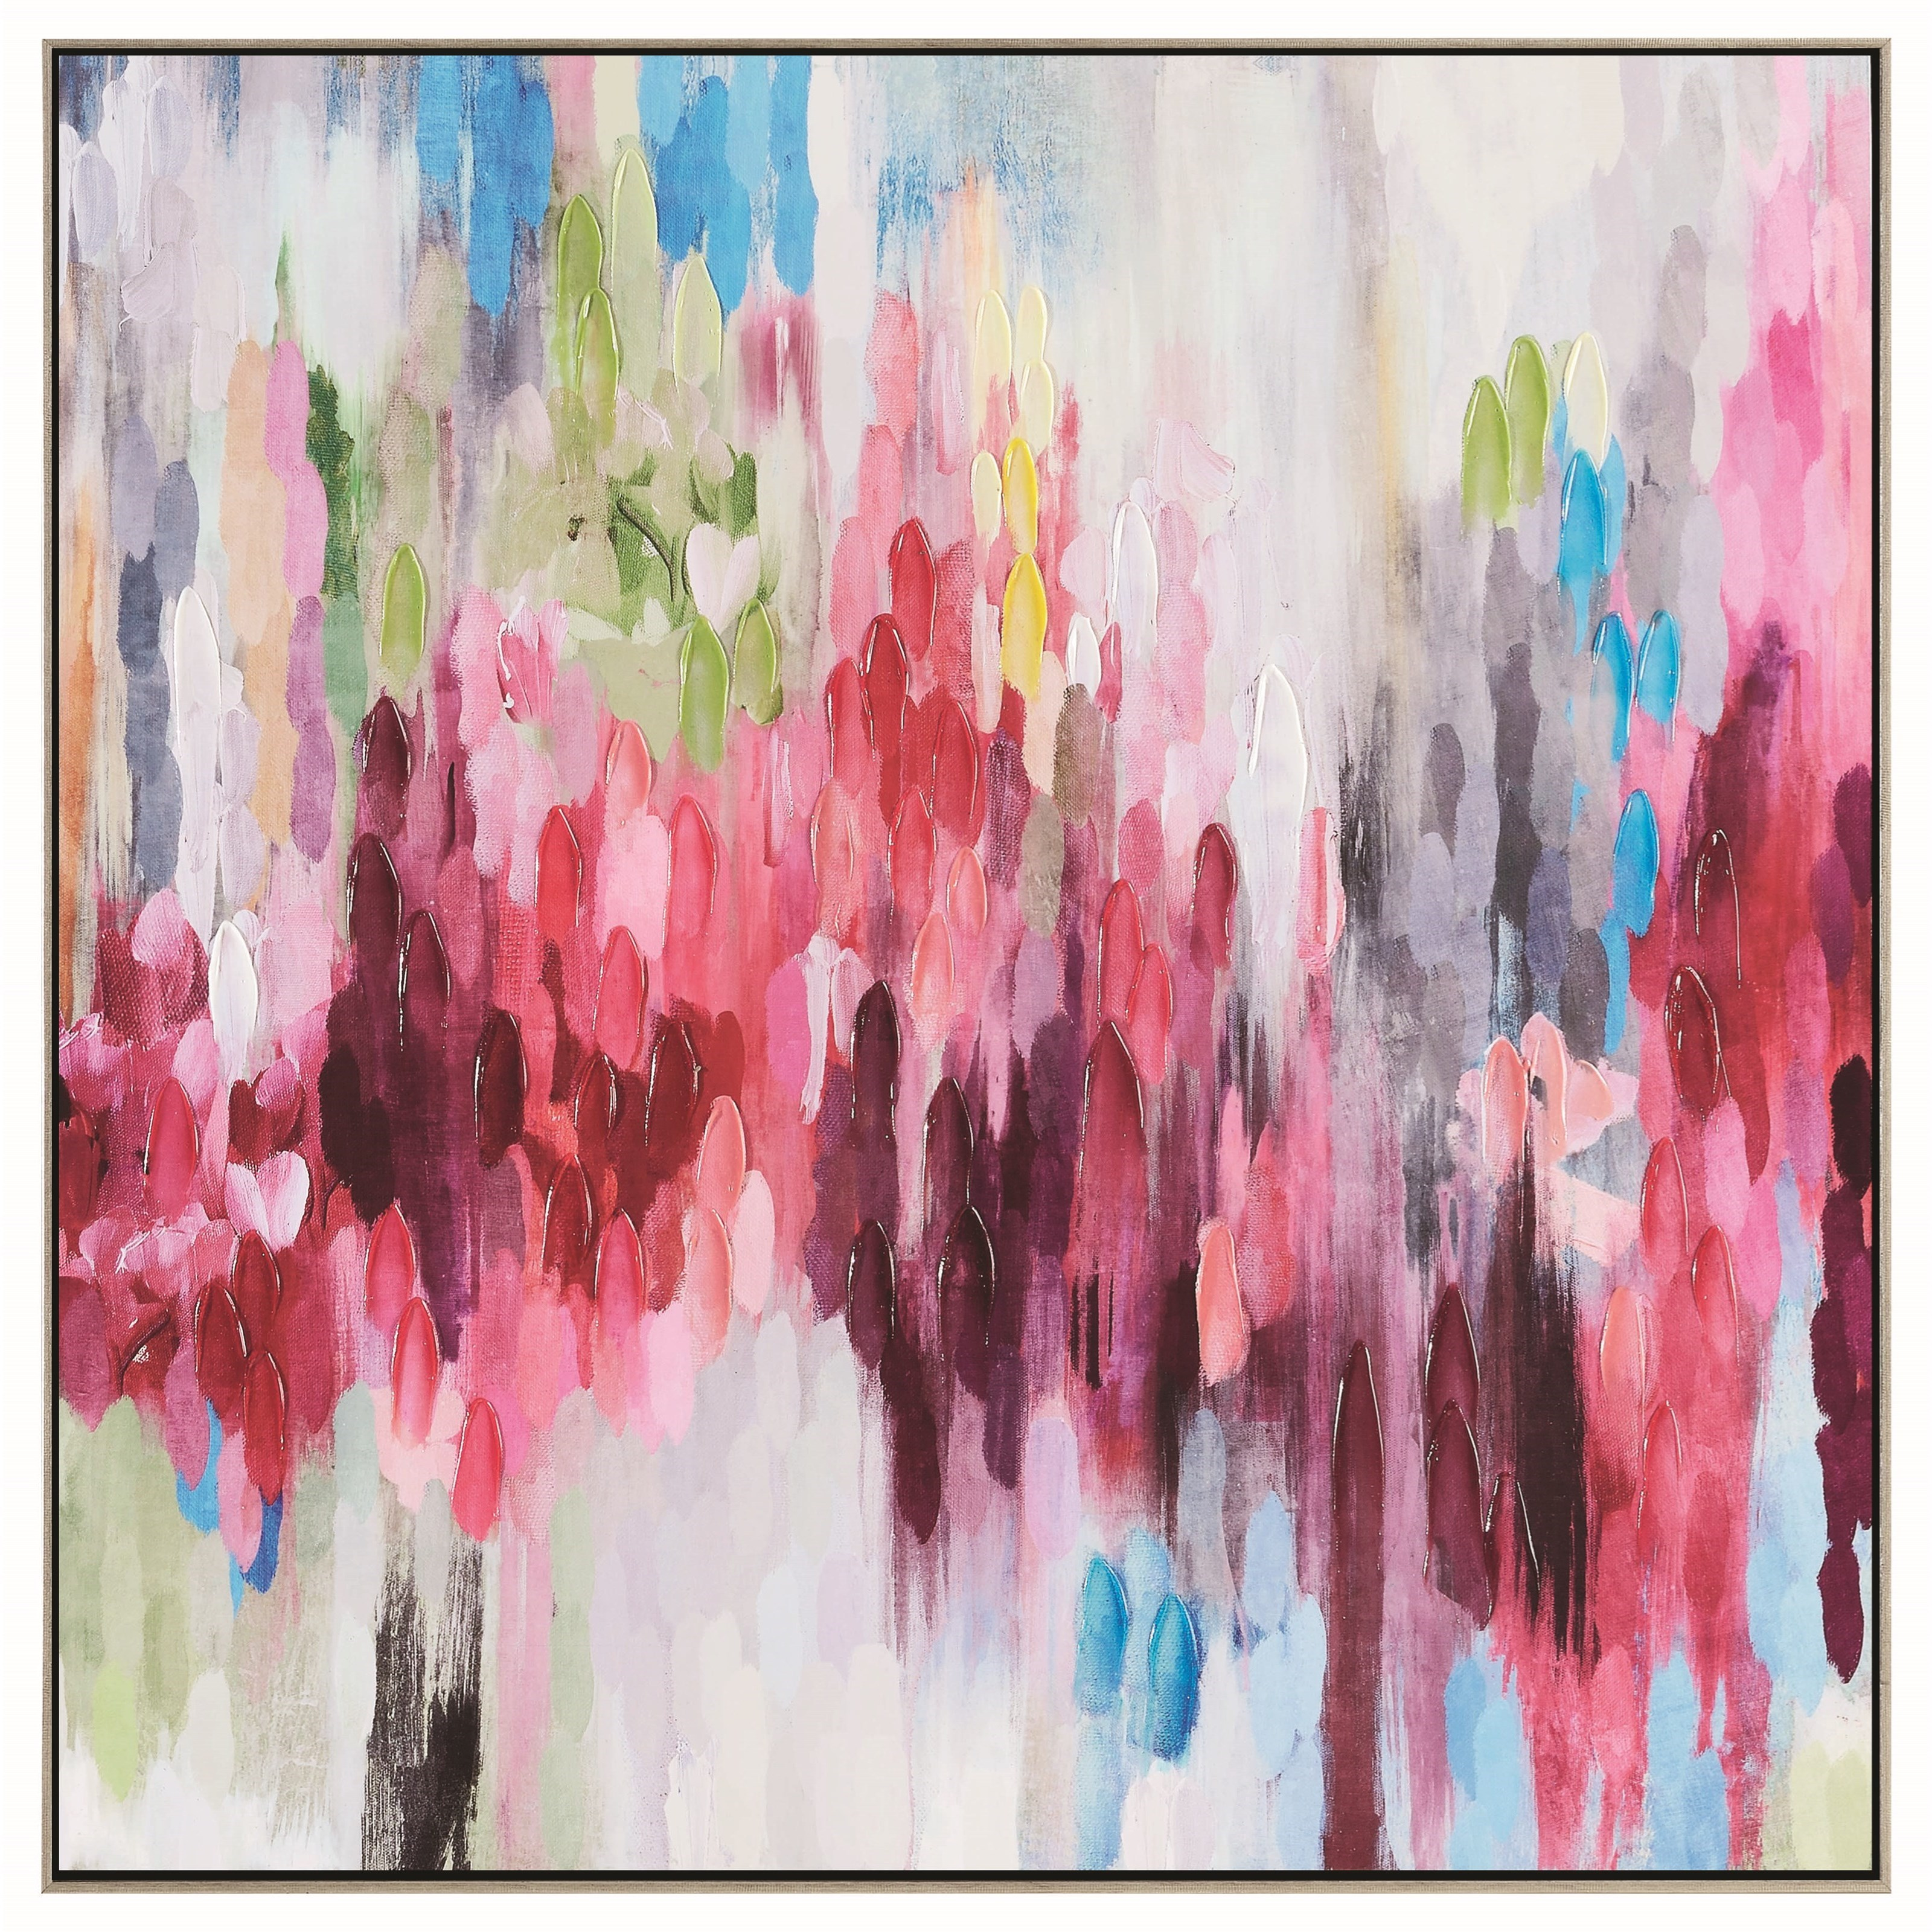 Coaster Wall Art Wall Art - Item Number: 961197